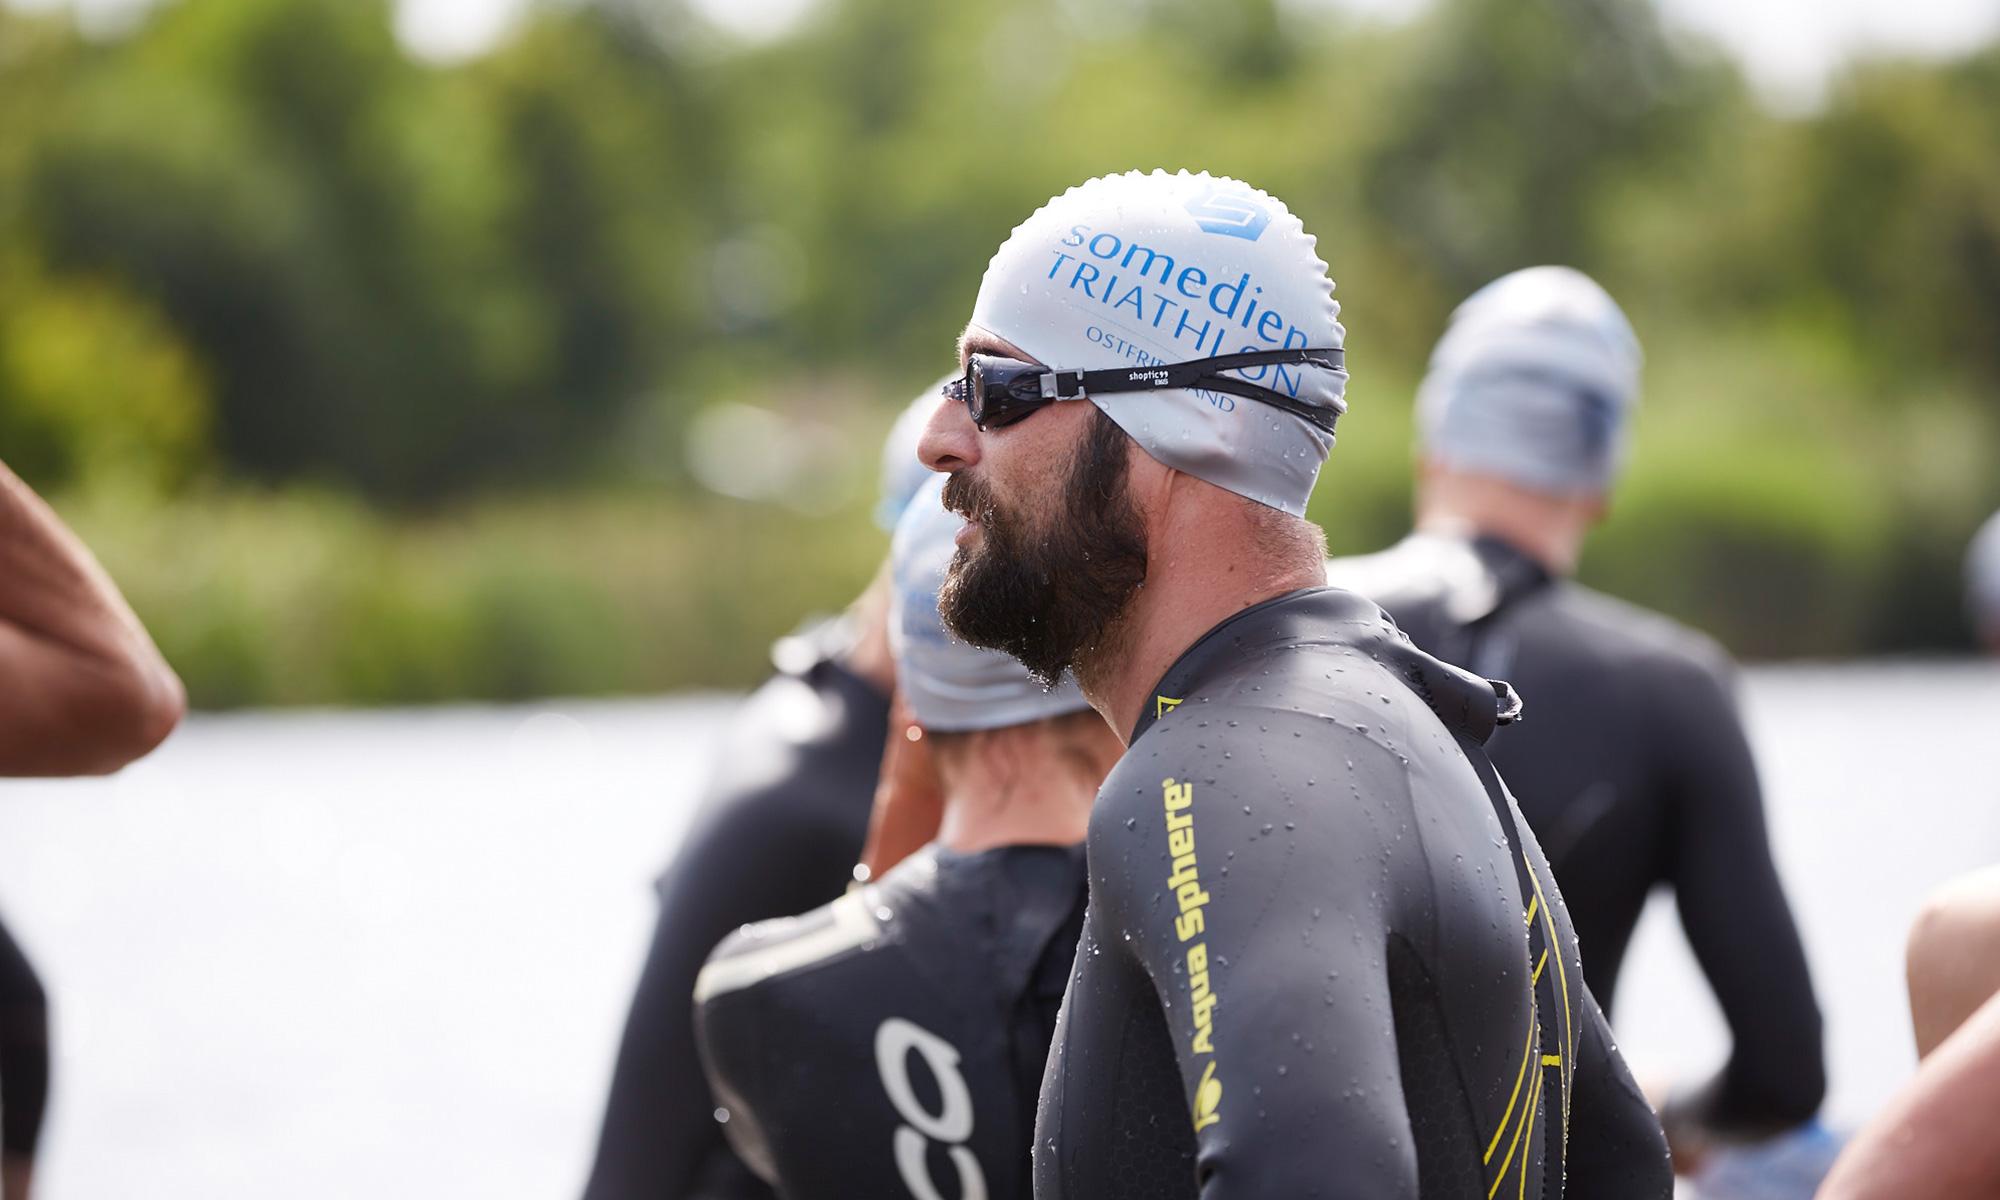 ref-triathlon-foto3